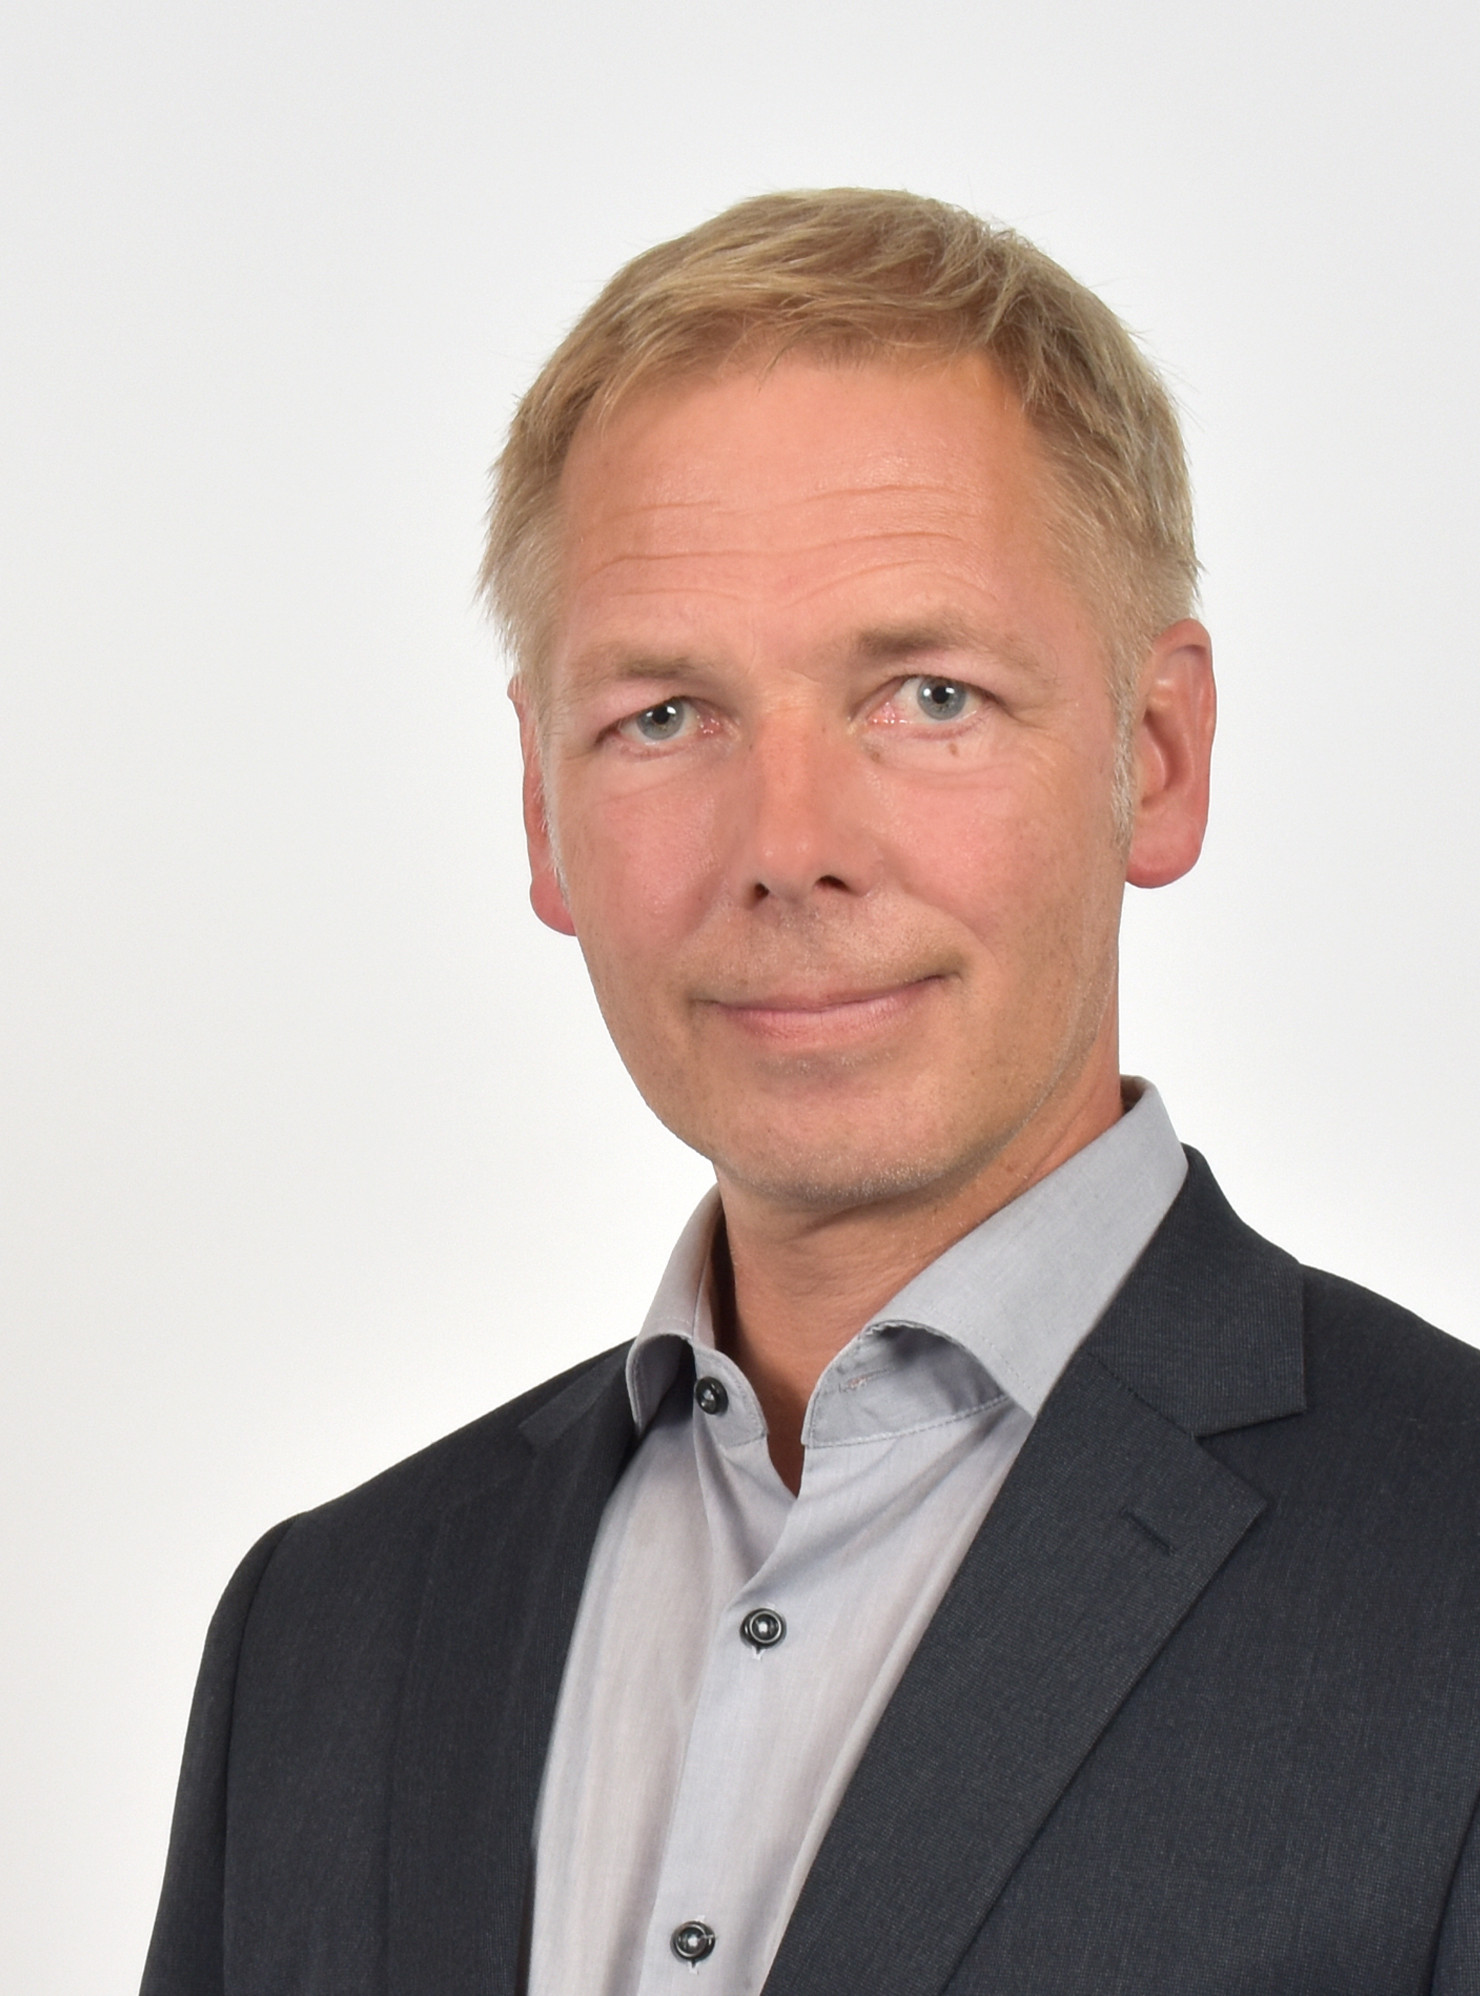 Jens Janson